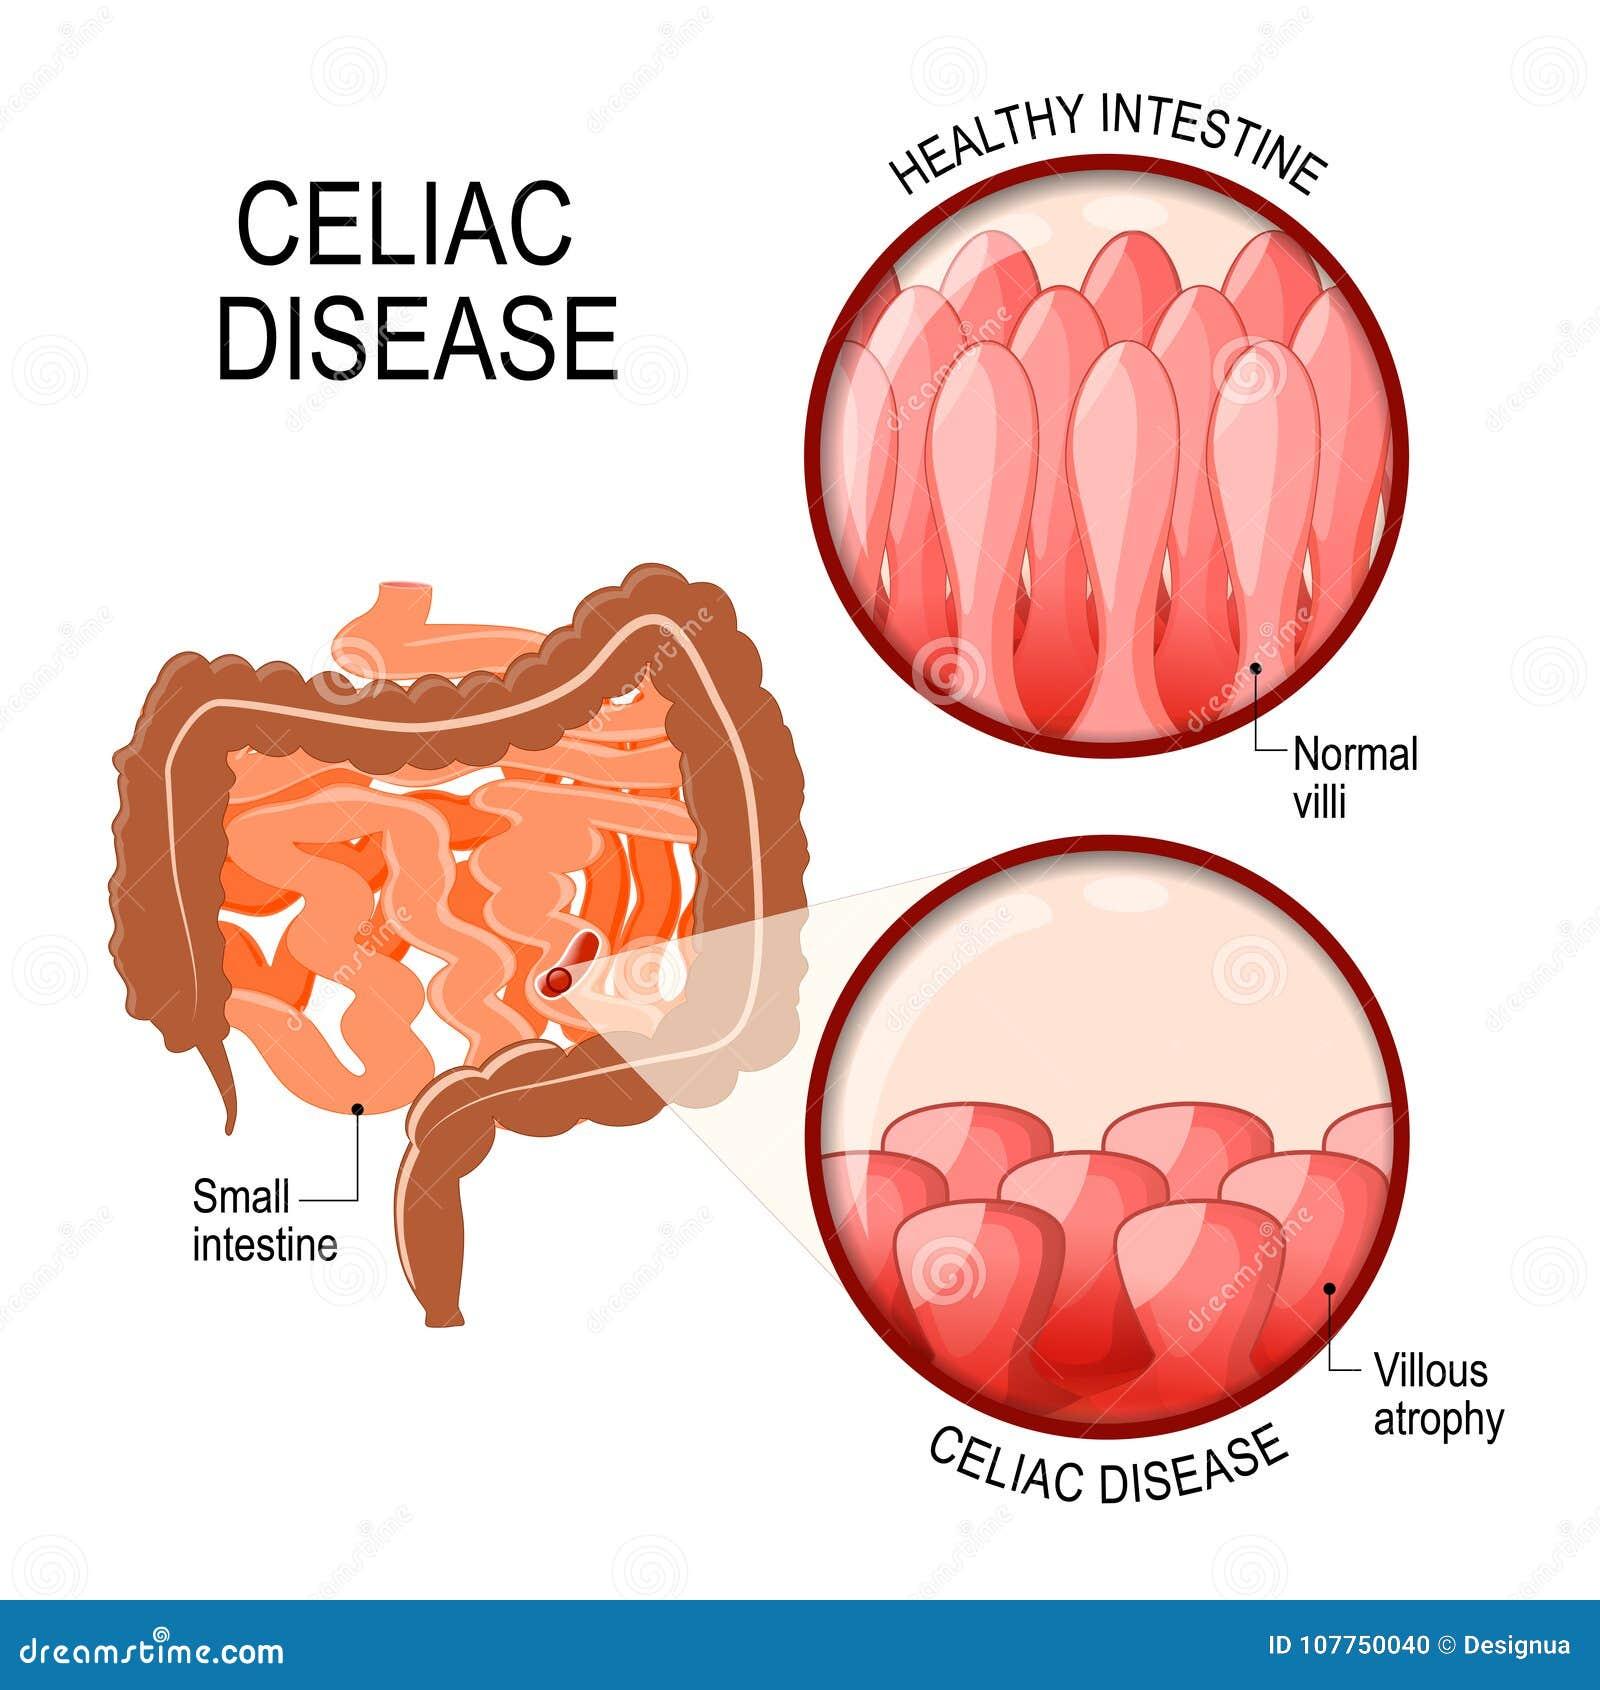 Celiac Disease Small Intestinal With Normal Villi And Villous